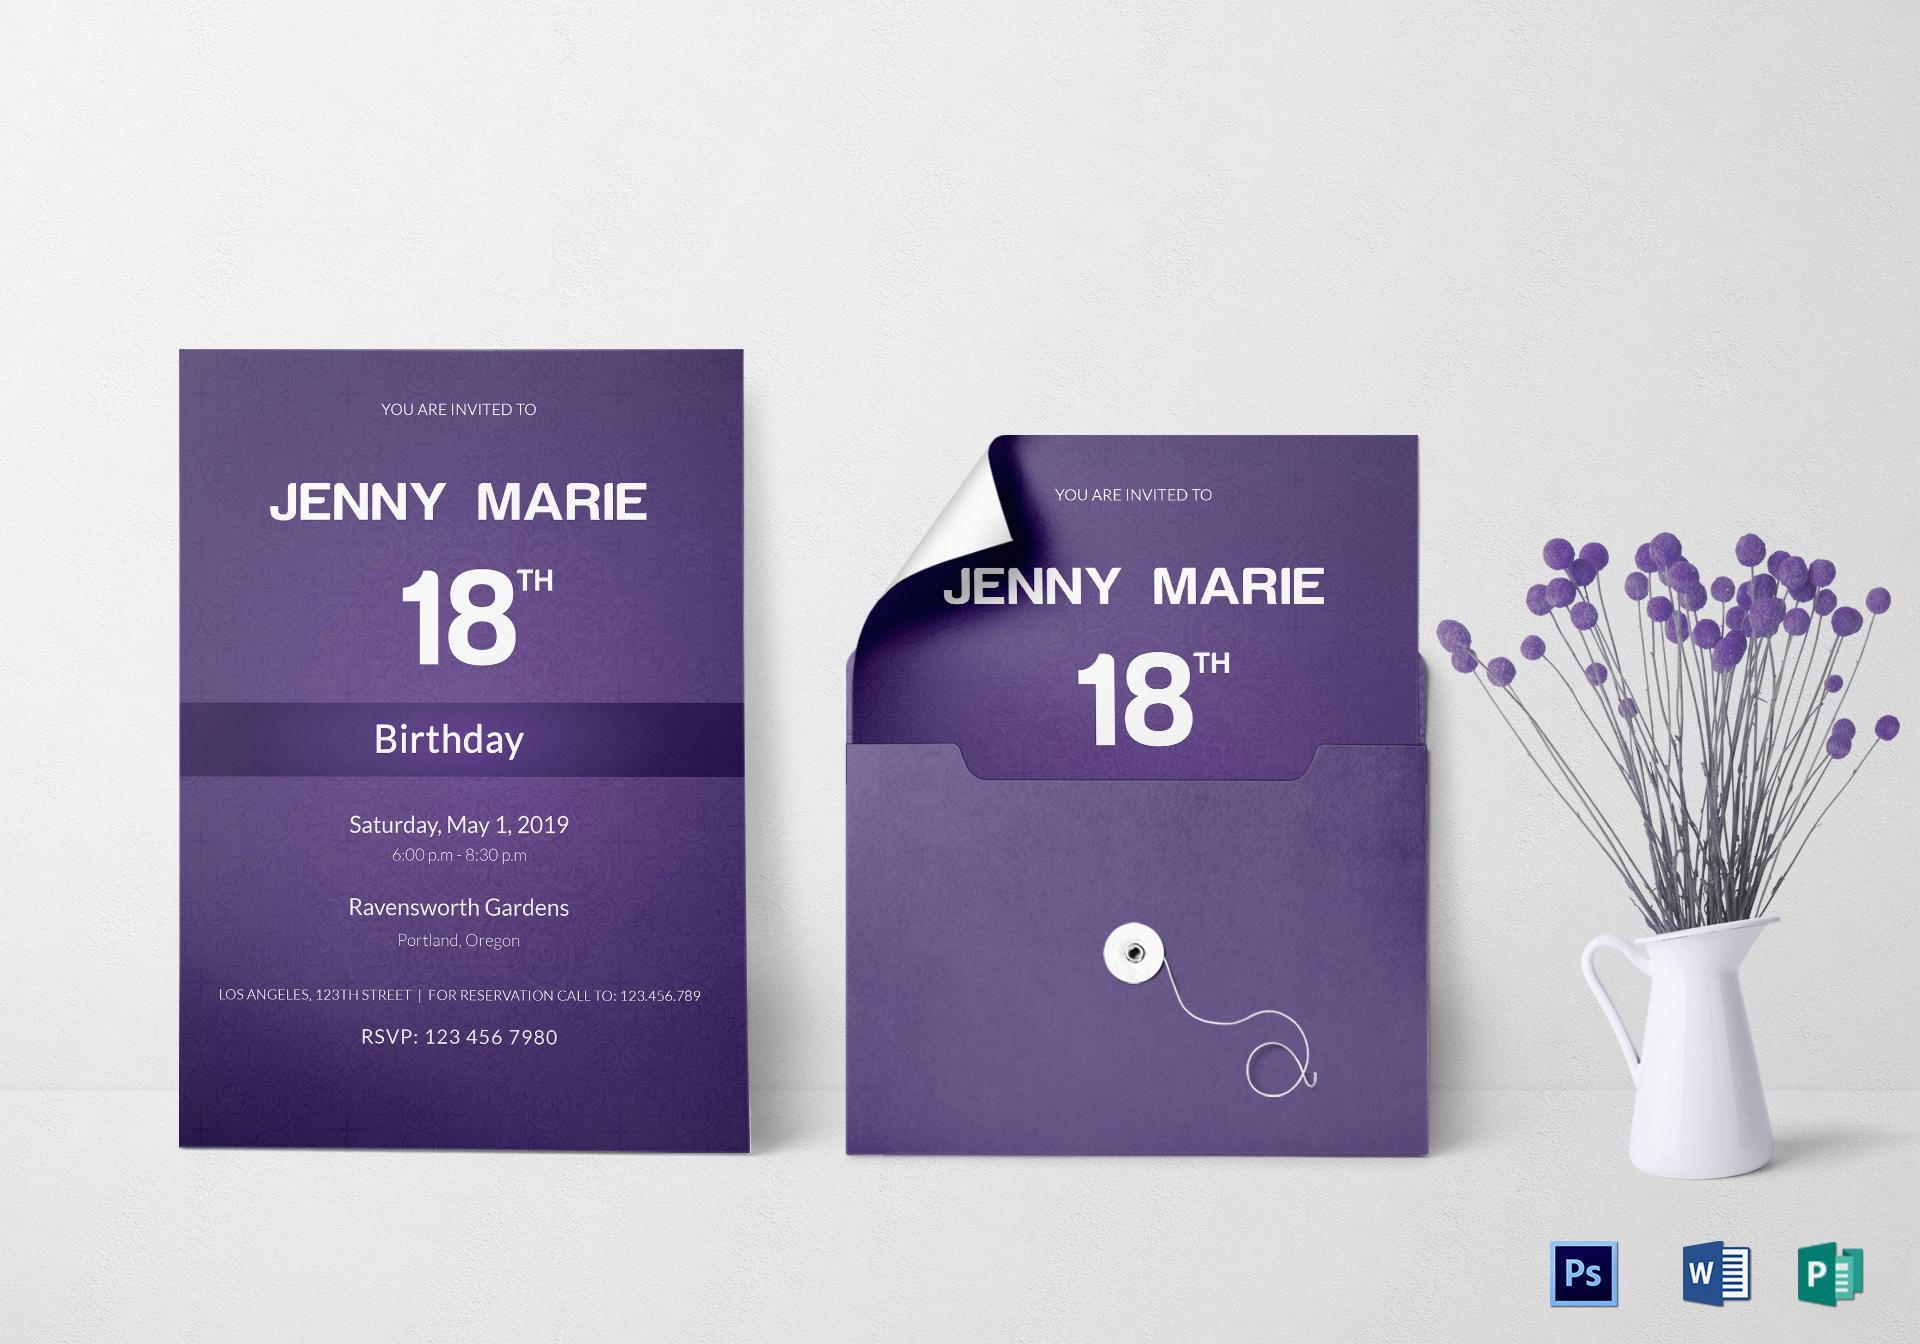 debut event invitation card design